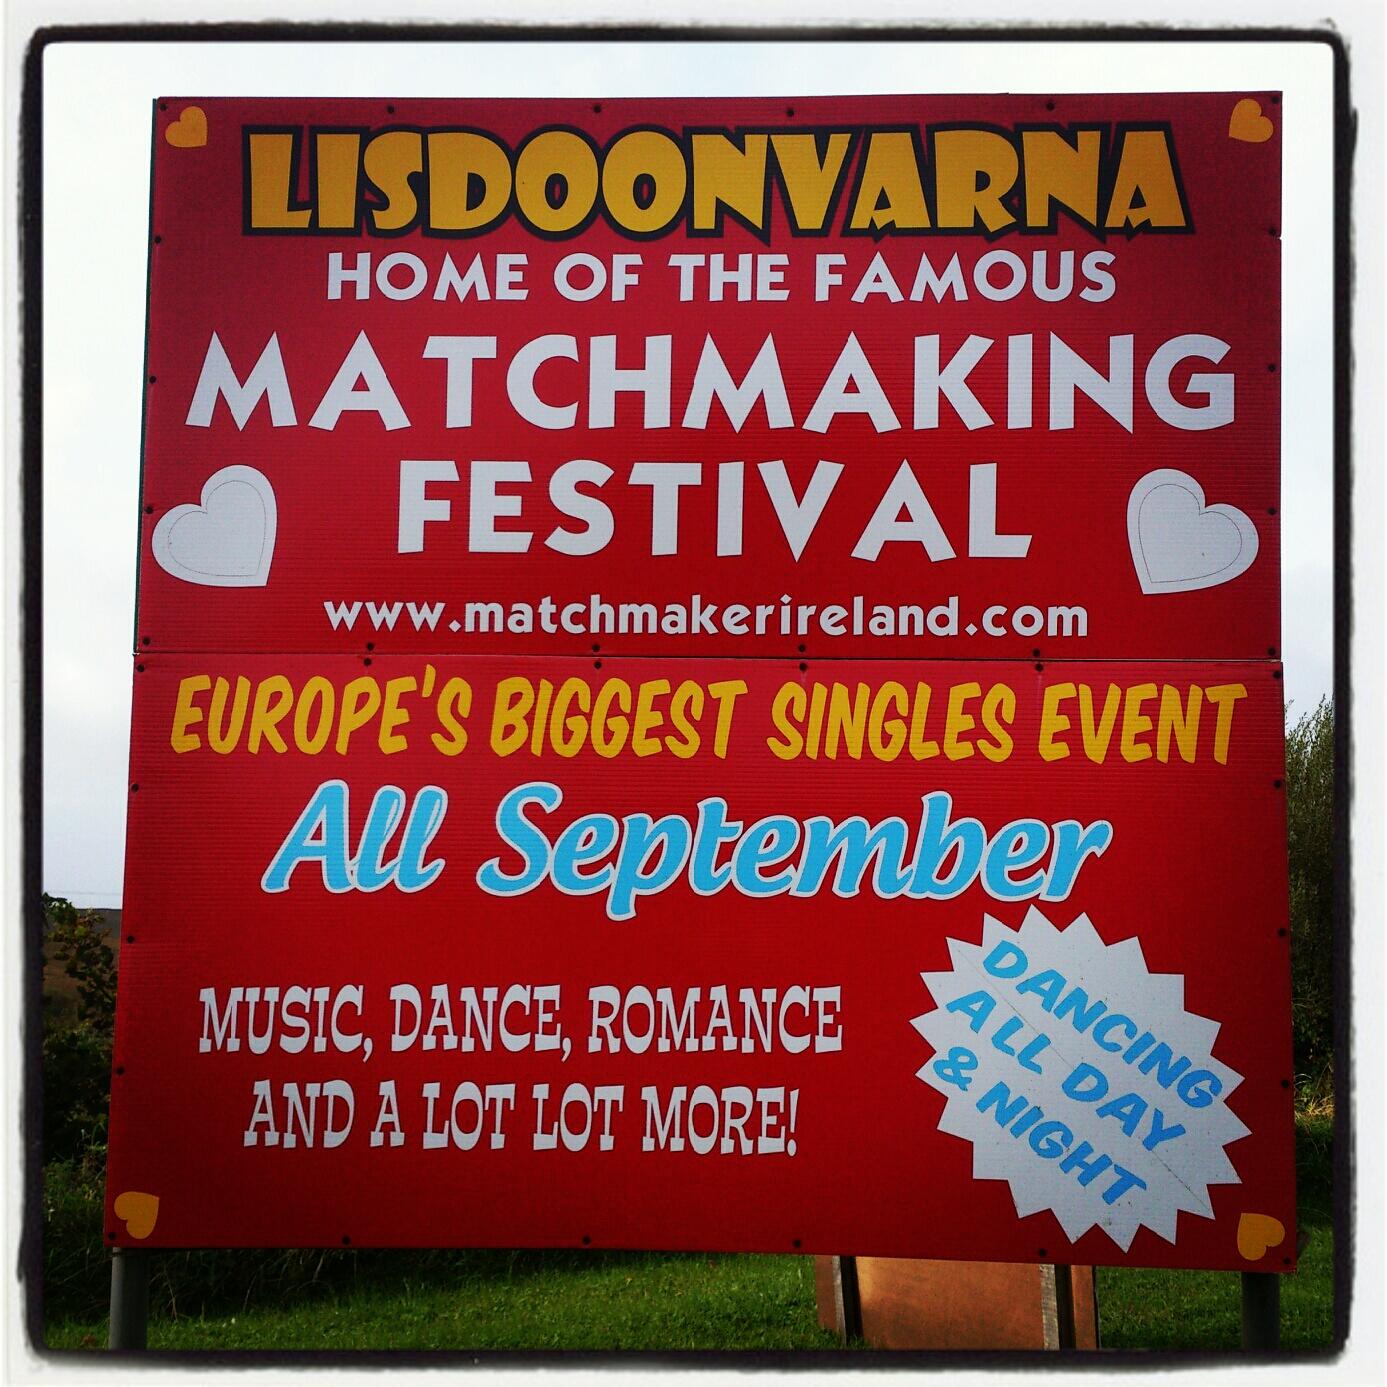 Matchmaking Festival Lisdoonvarna